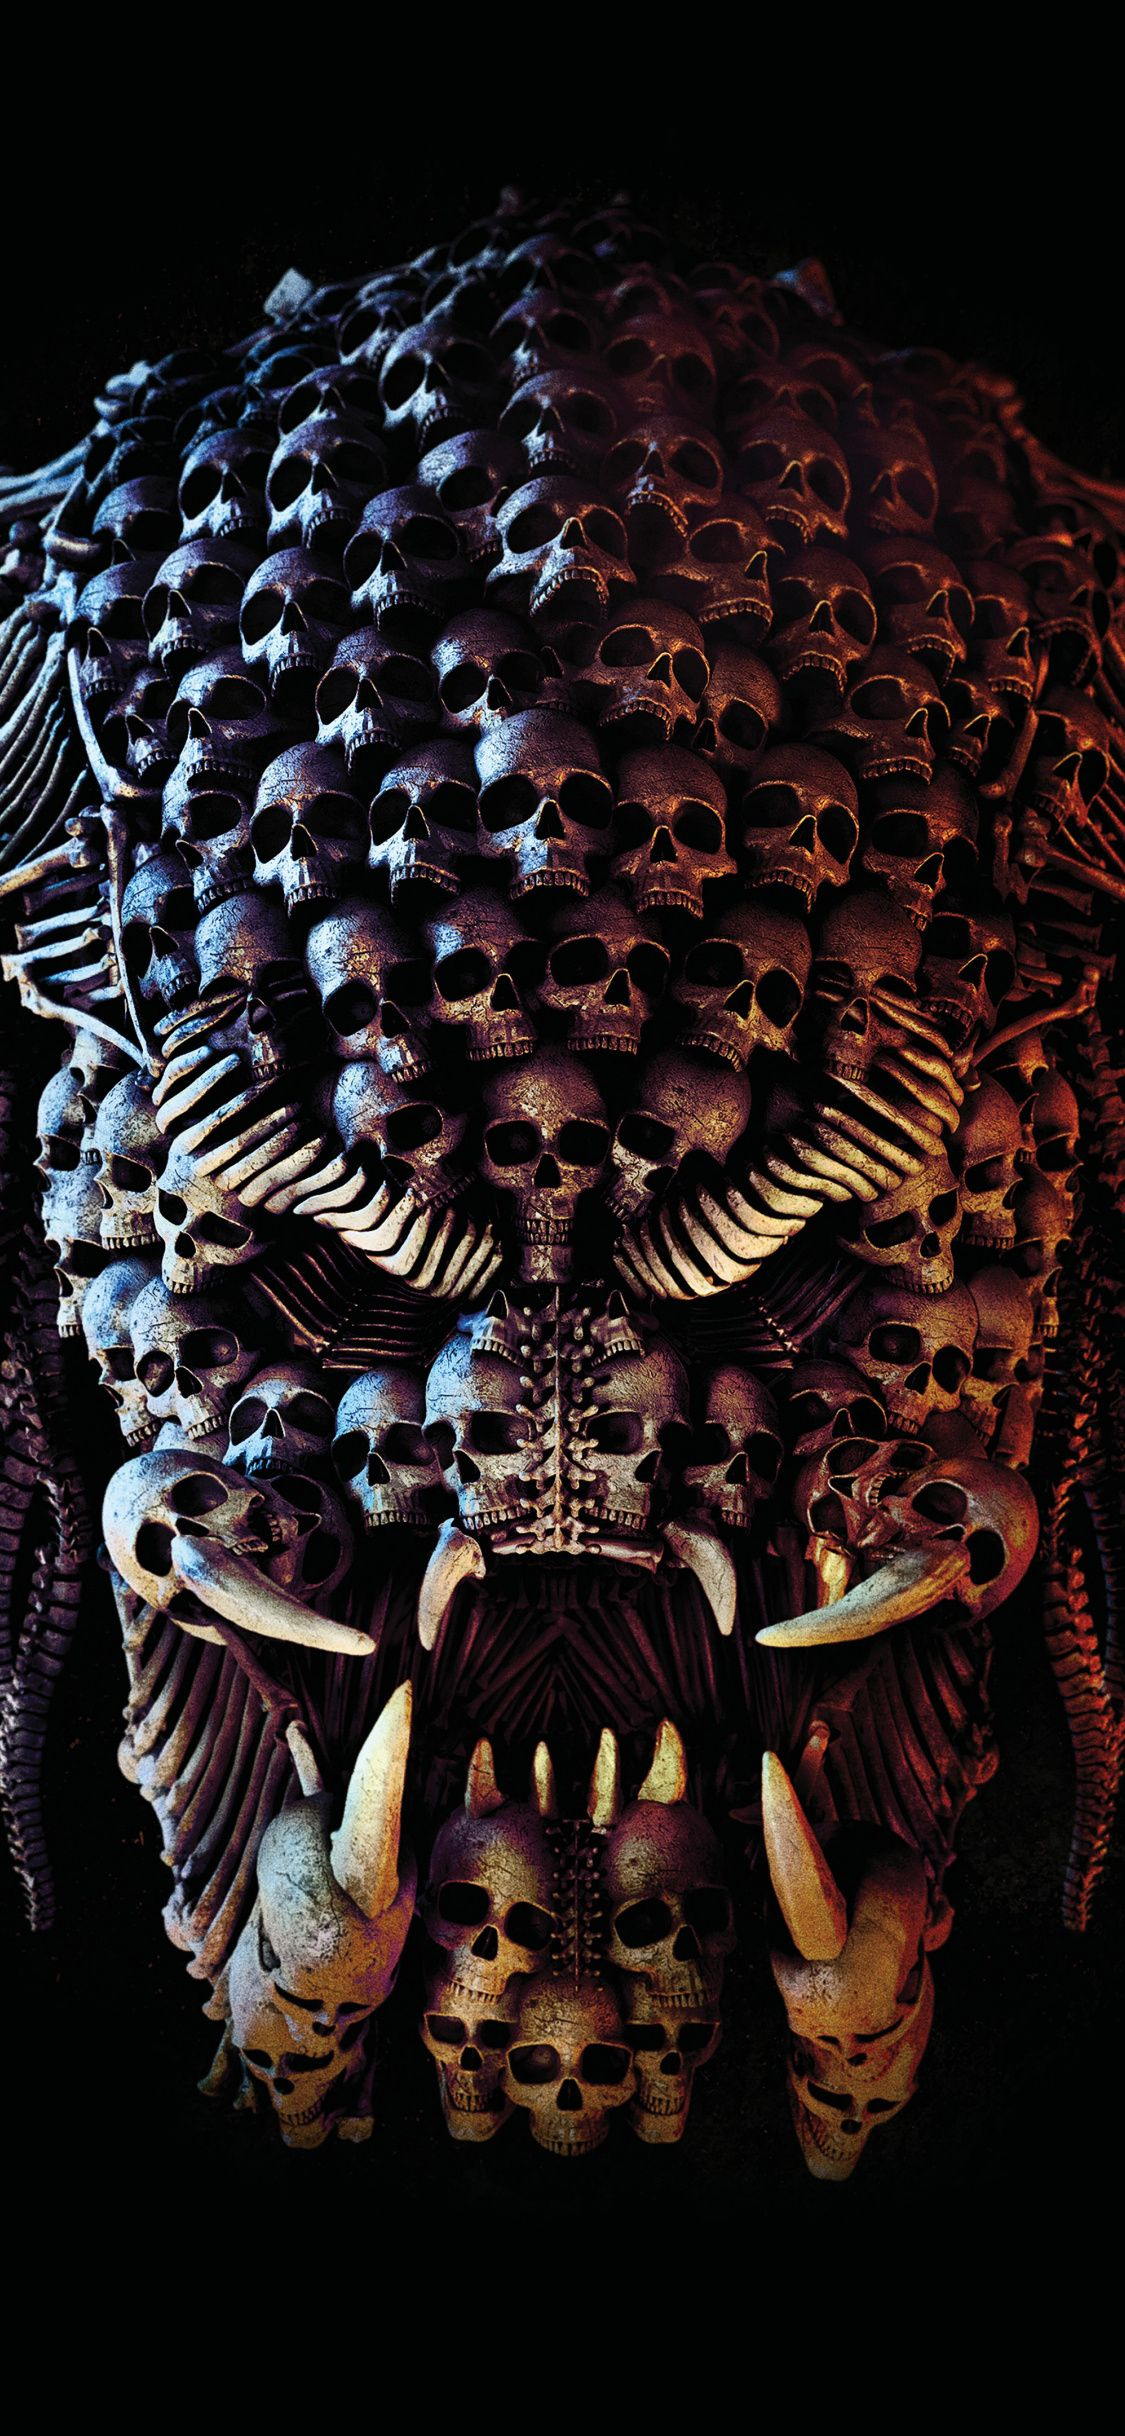 The Predator Creepy Face Skulls Movie 2018 1125x2436